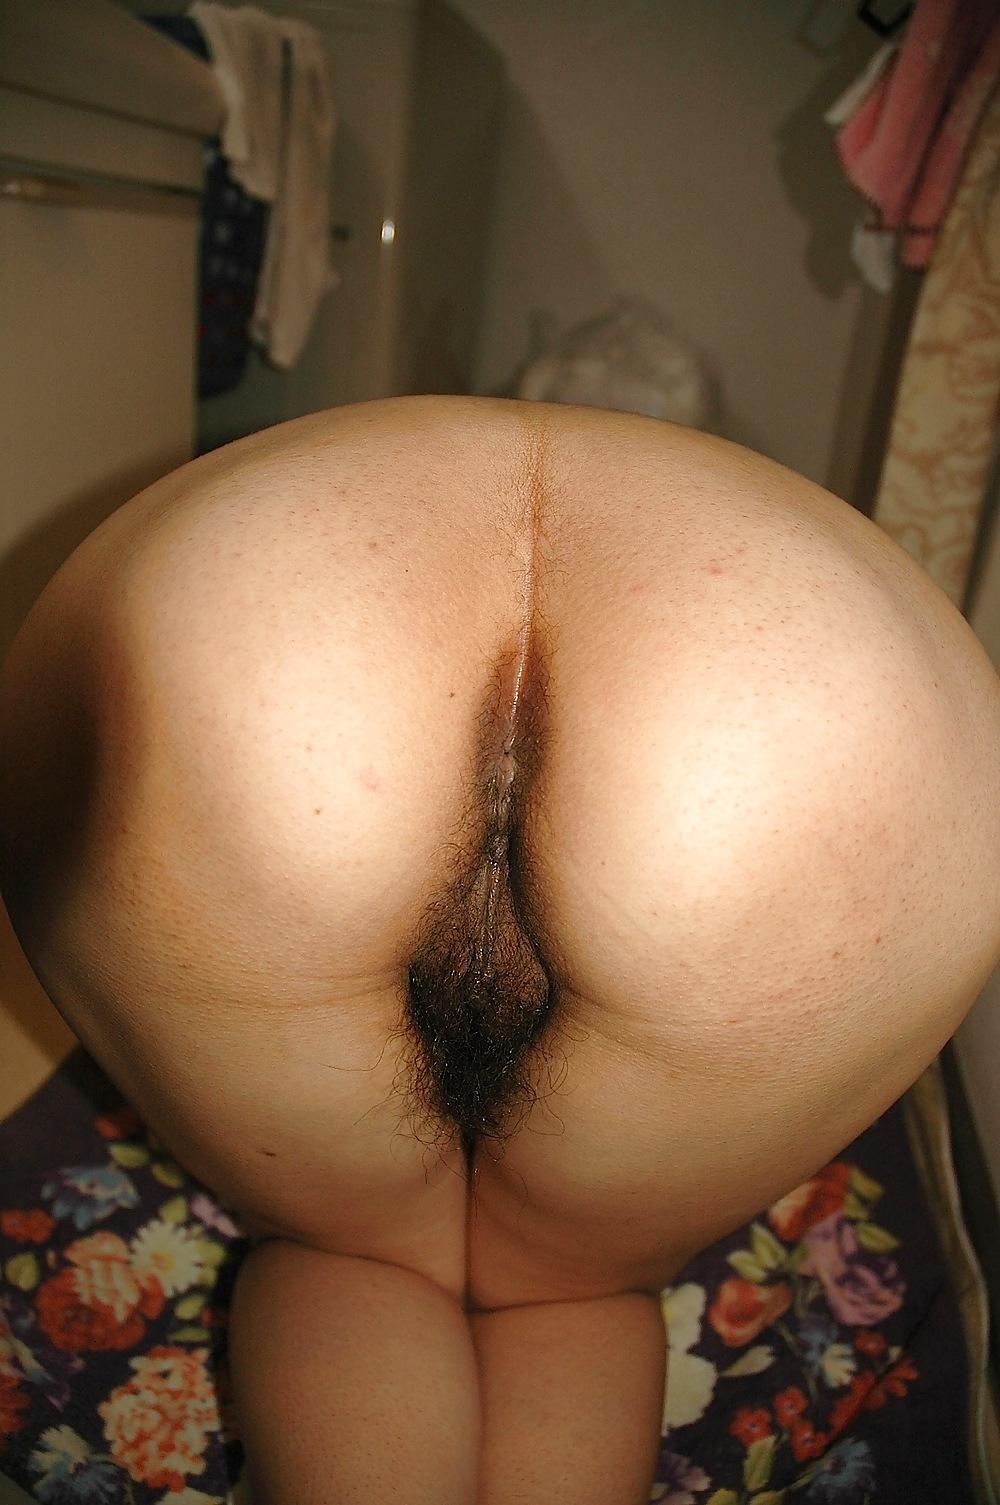 Hairy Bent Over 9 Pics Xhamster